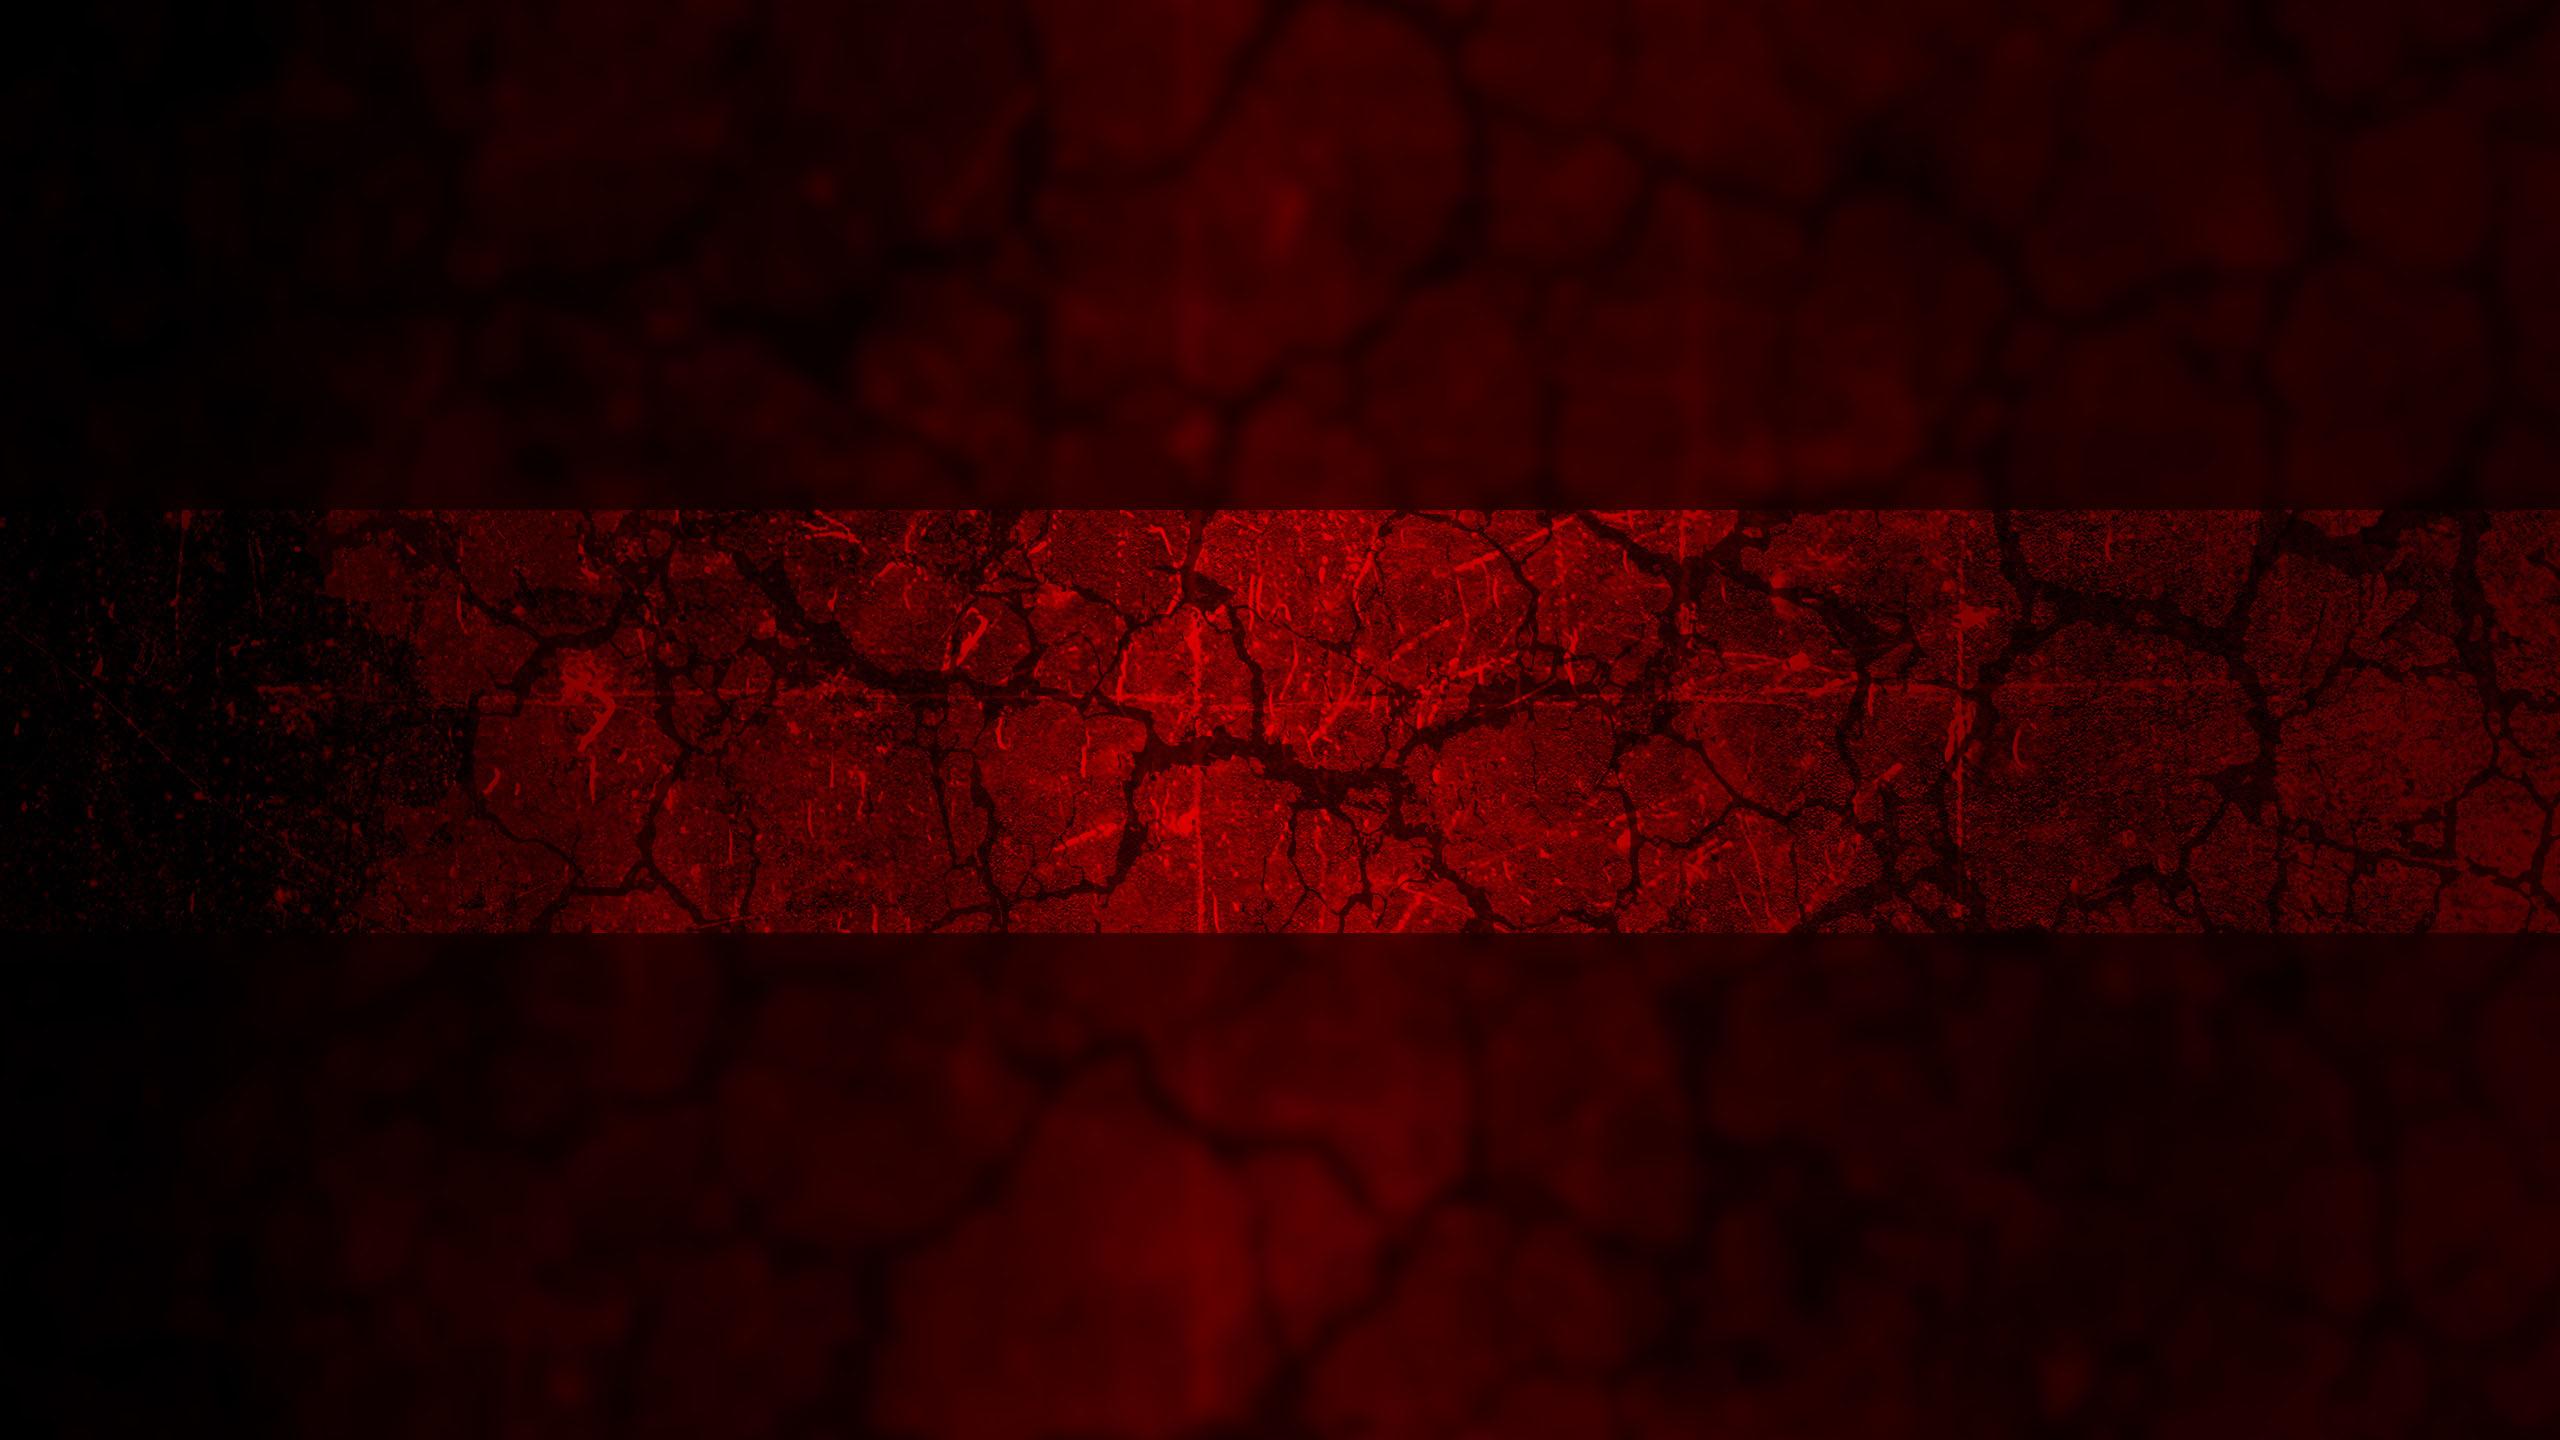 Картинка - темно бордовый фон для шапки ютуб.